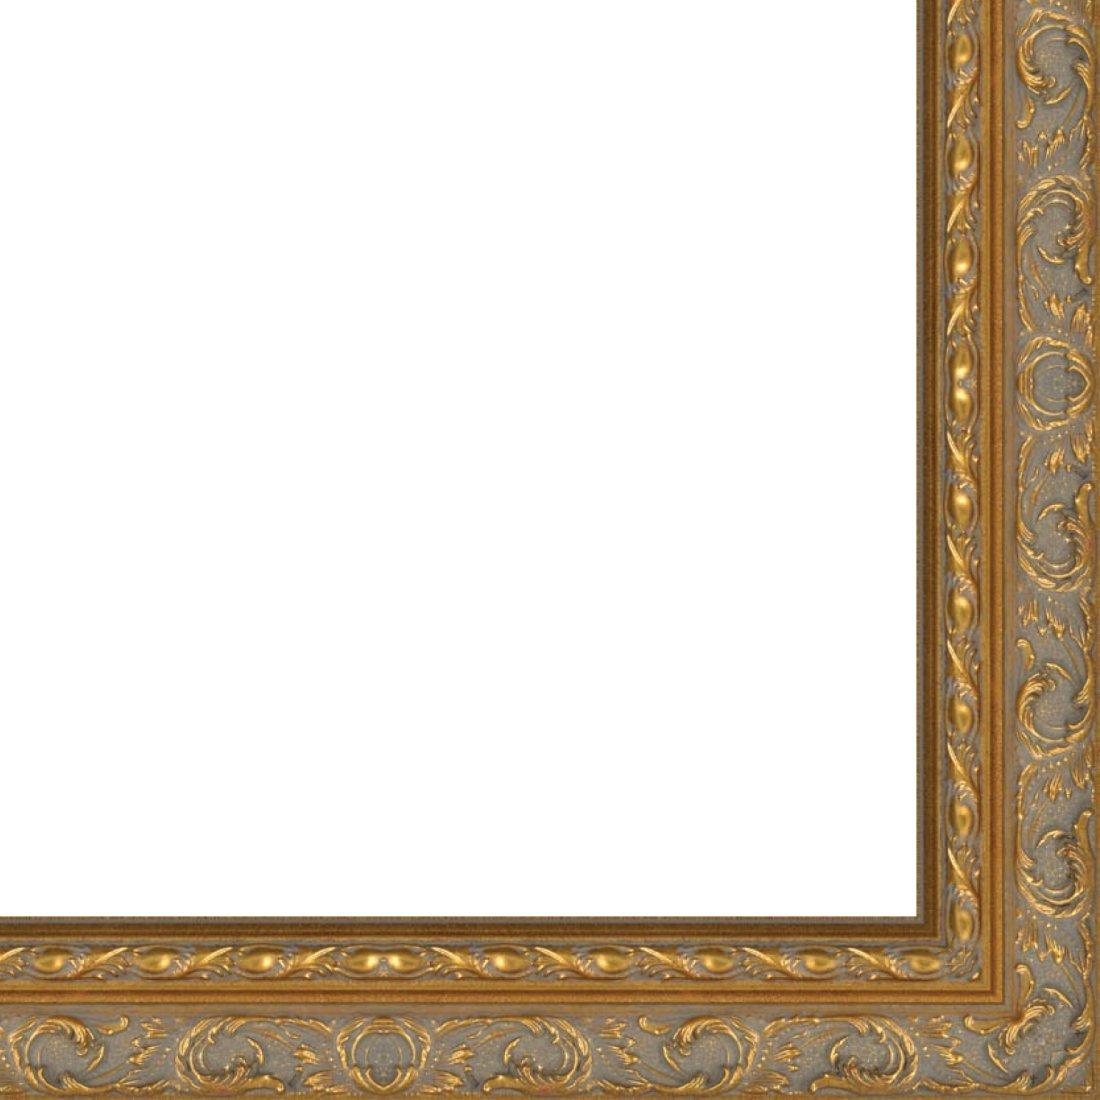 Picture Frame Moulding (Wood) 18ft Bundle - Traditional Antique Gold Finish - 2'' Width - 3/8'' Rabbet Depth